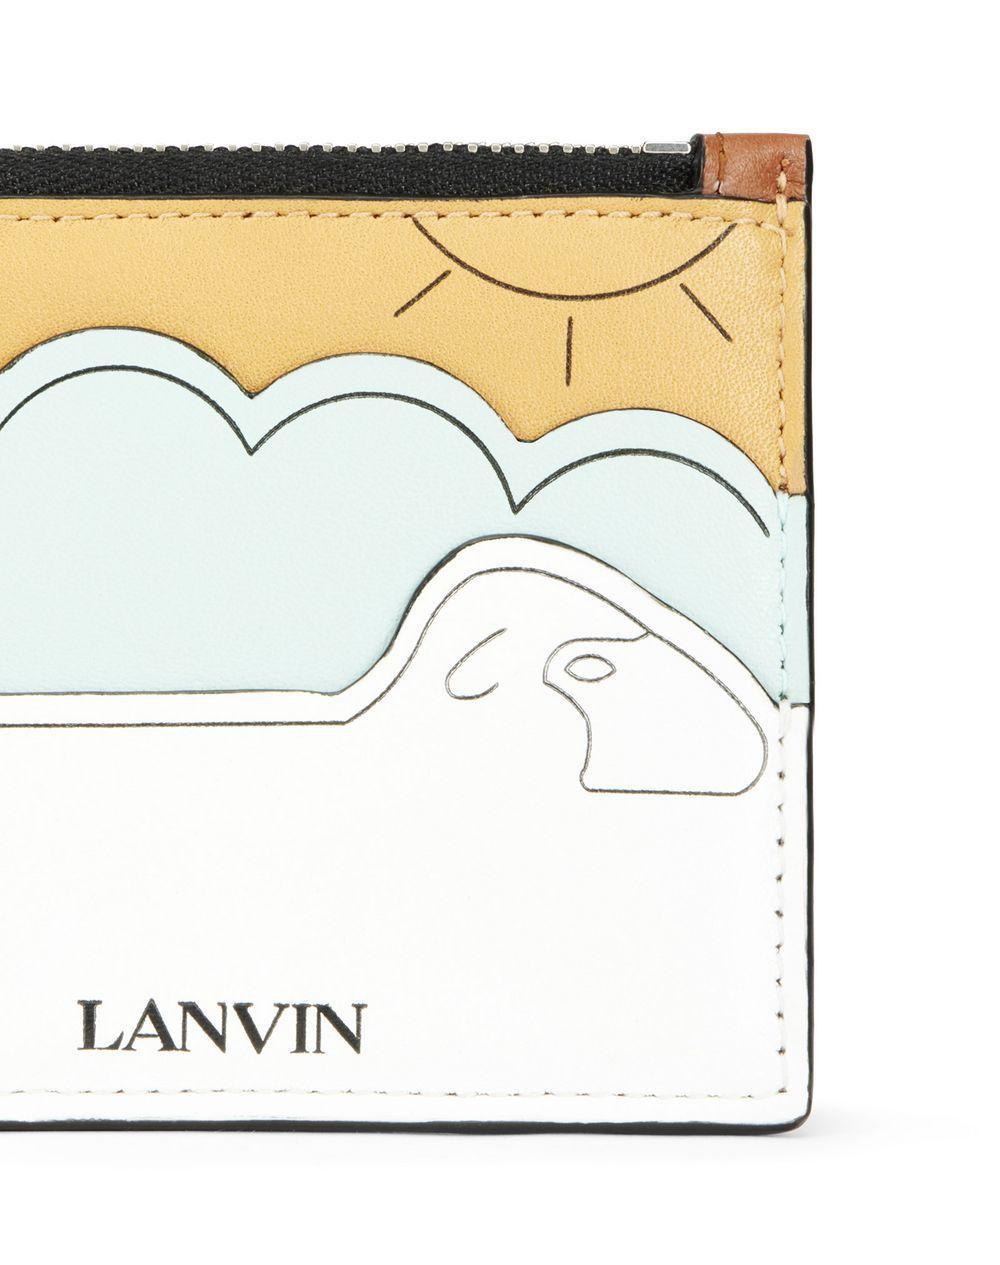 BABAR PRINT ZIPPED WALLET - Lanvin